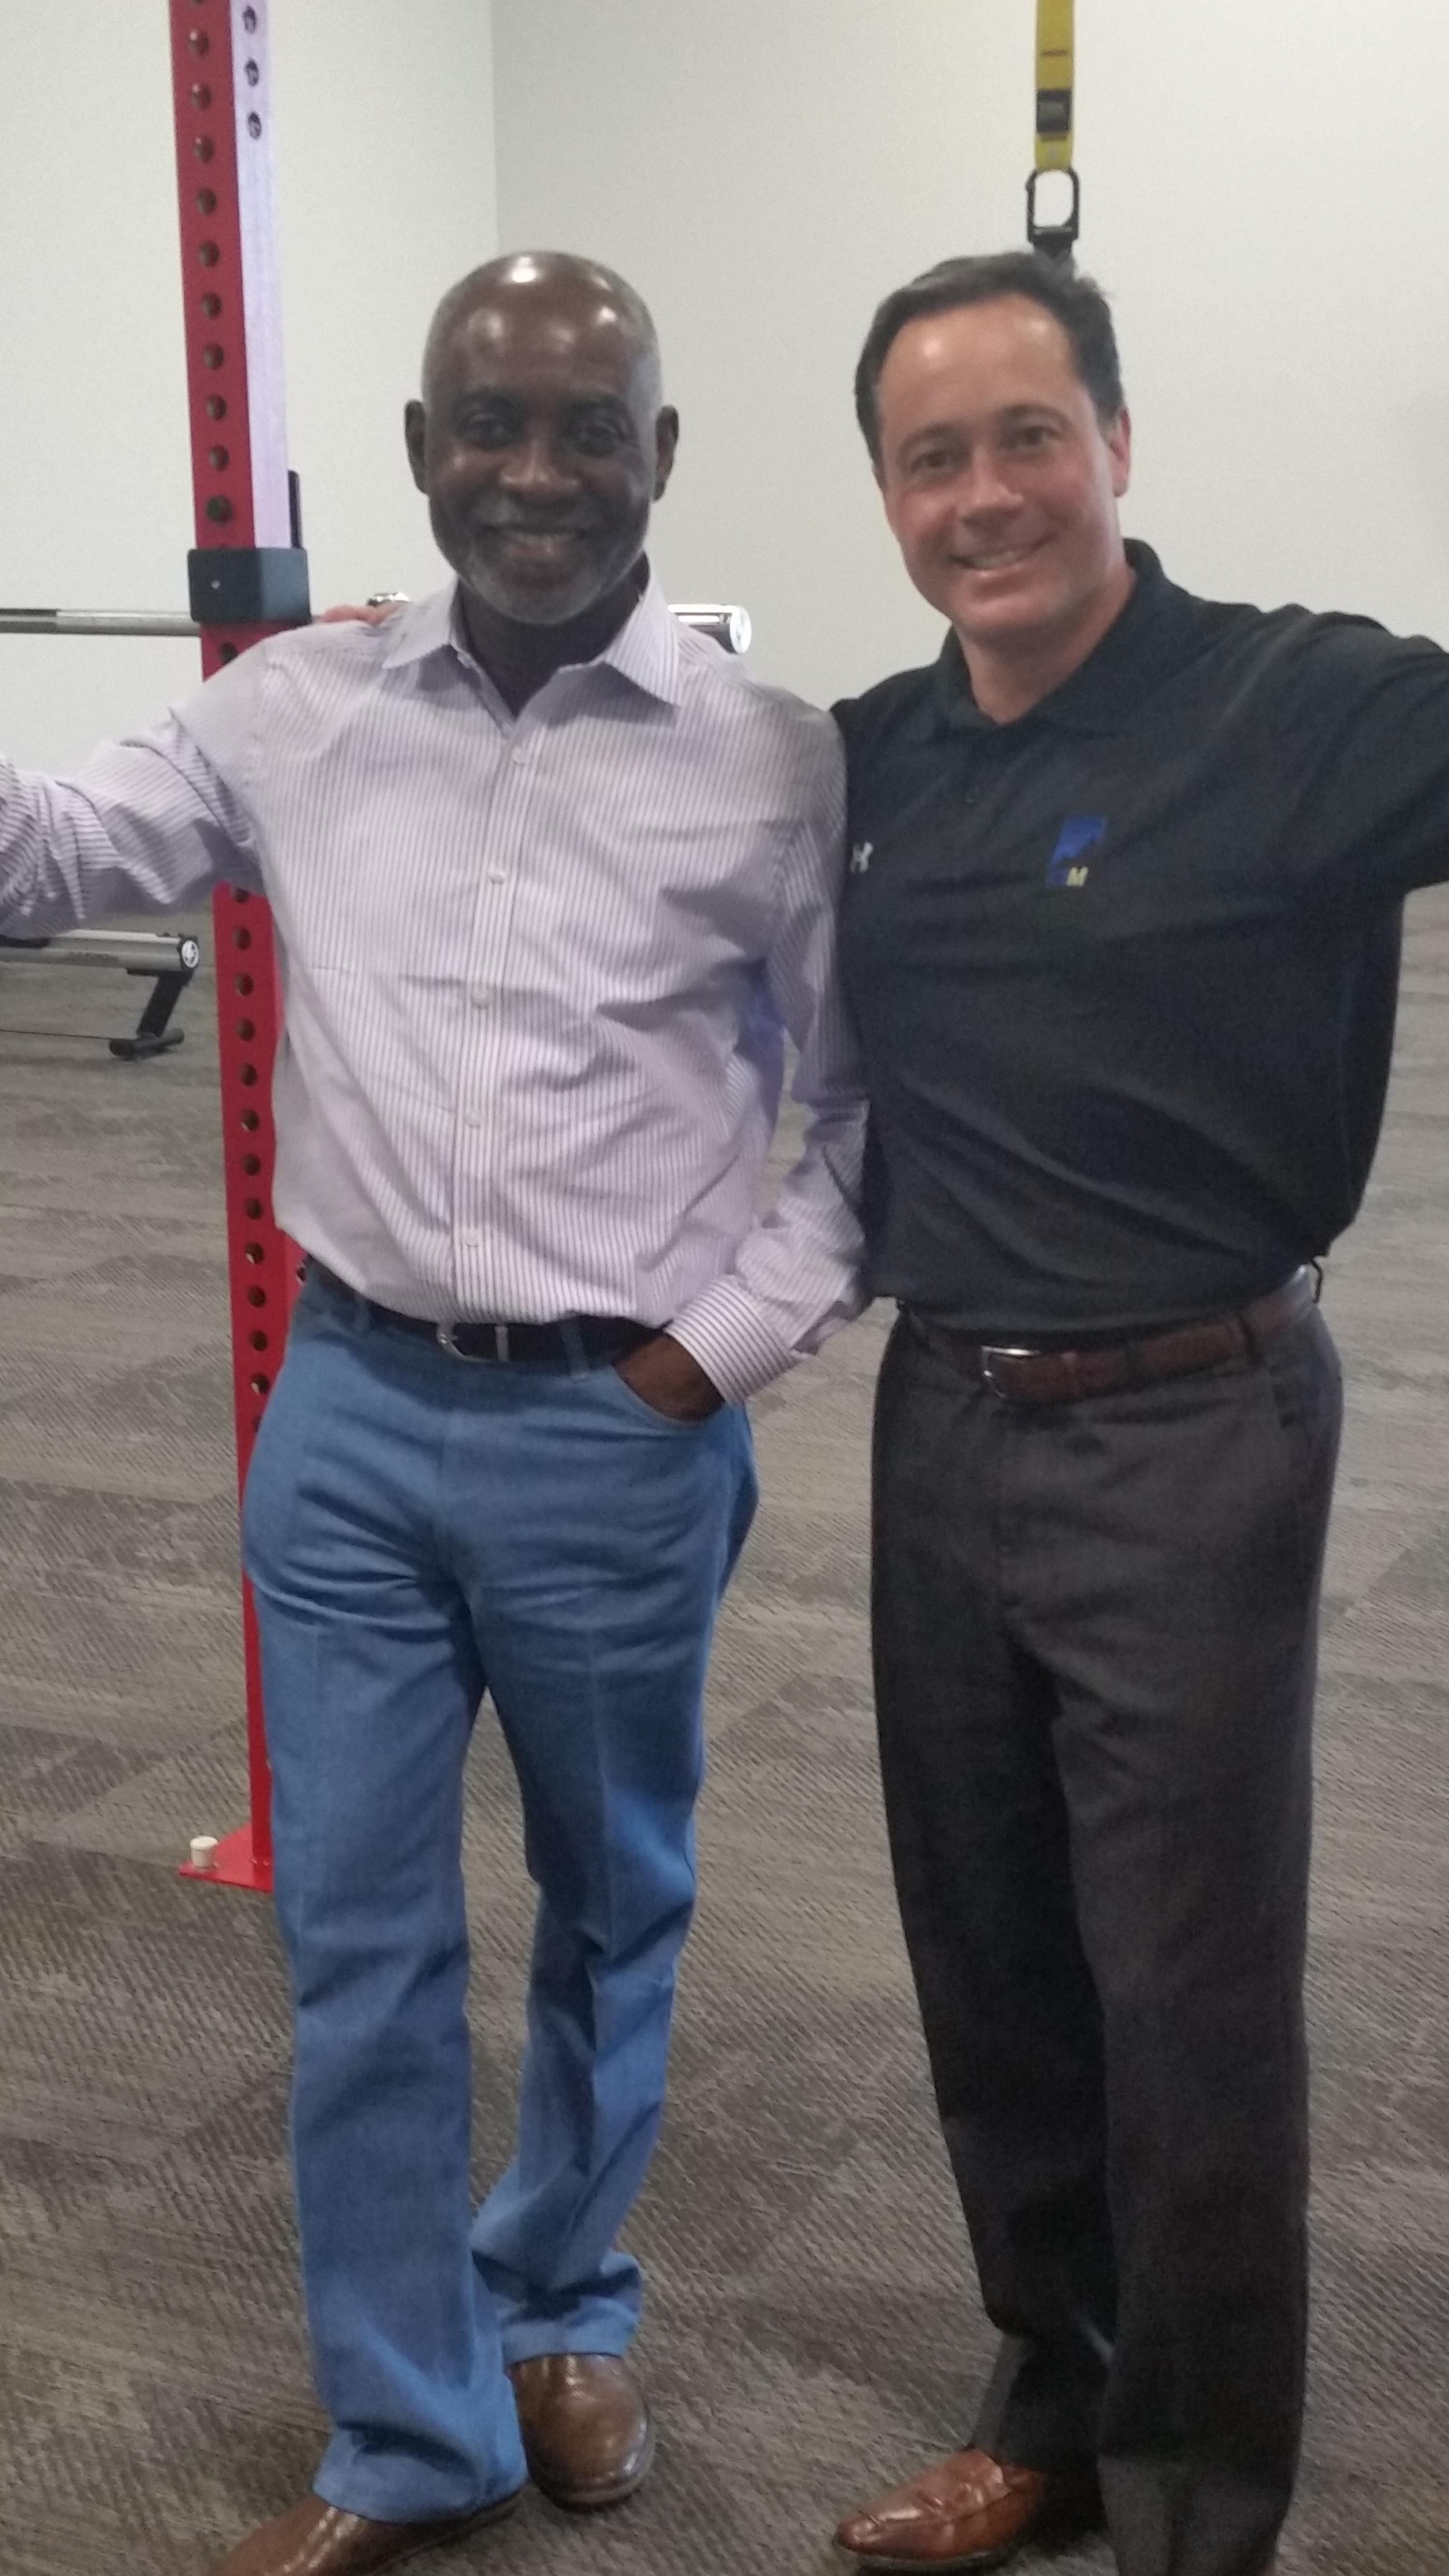 Professor Boachie-Adjei and K2M CEO Mr. Eric Major